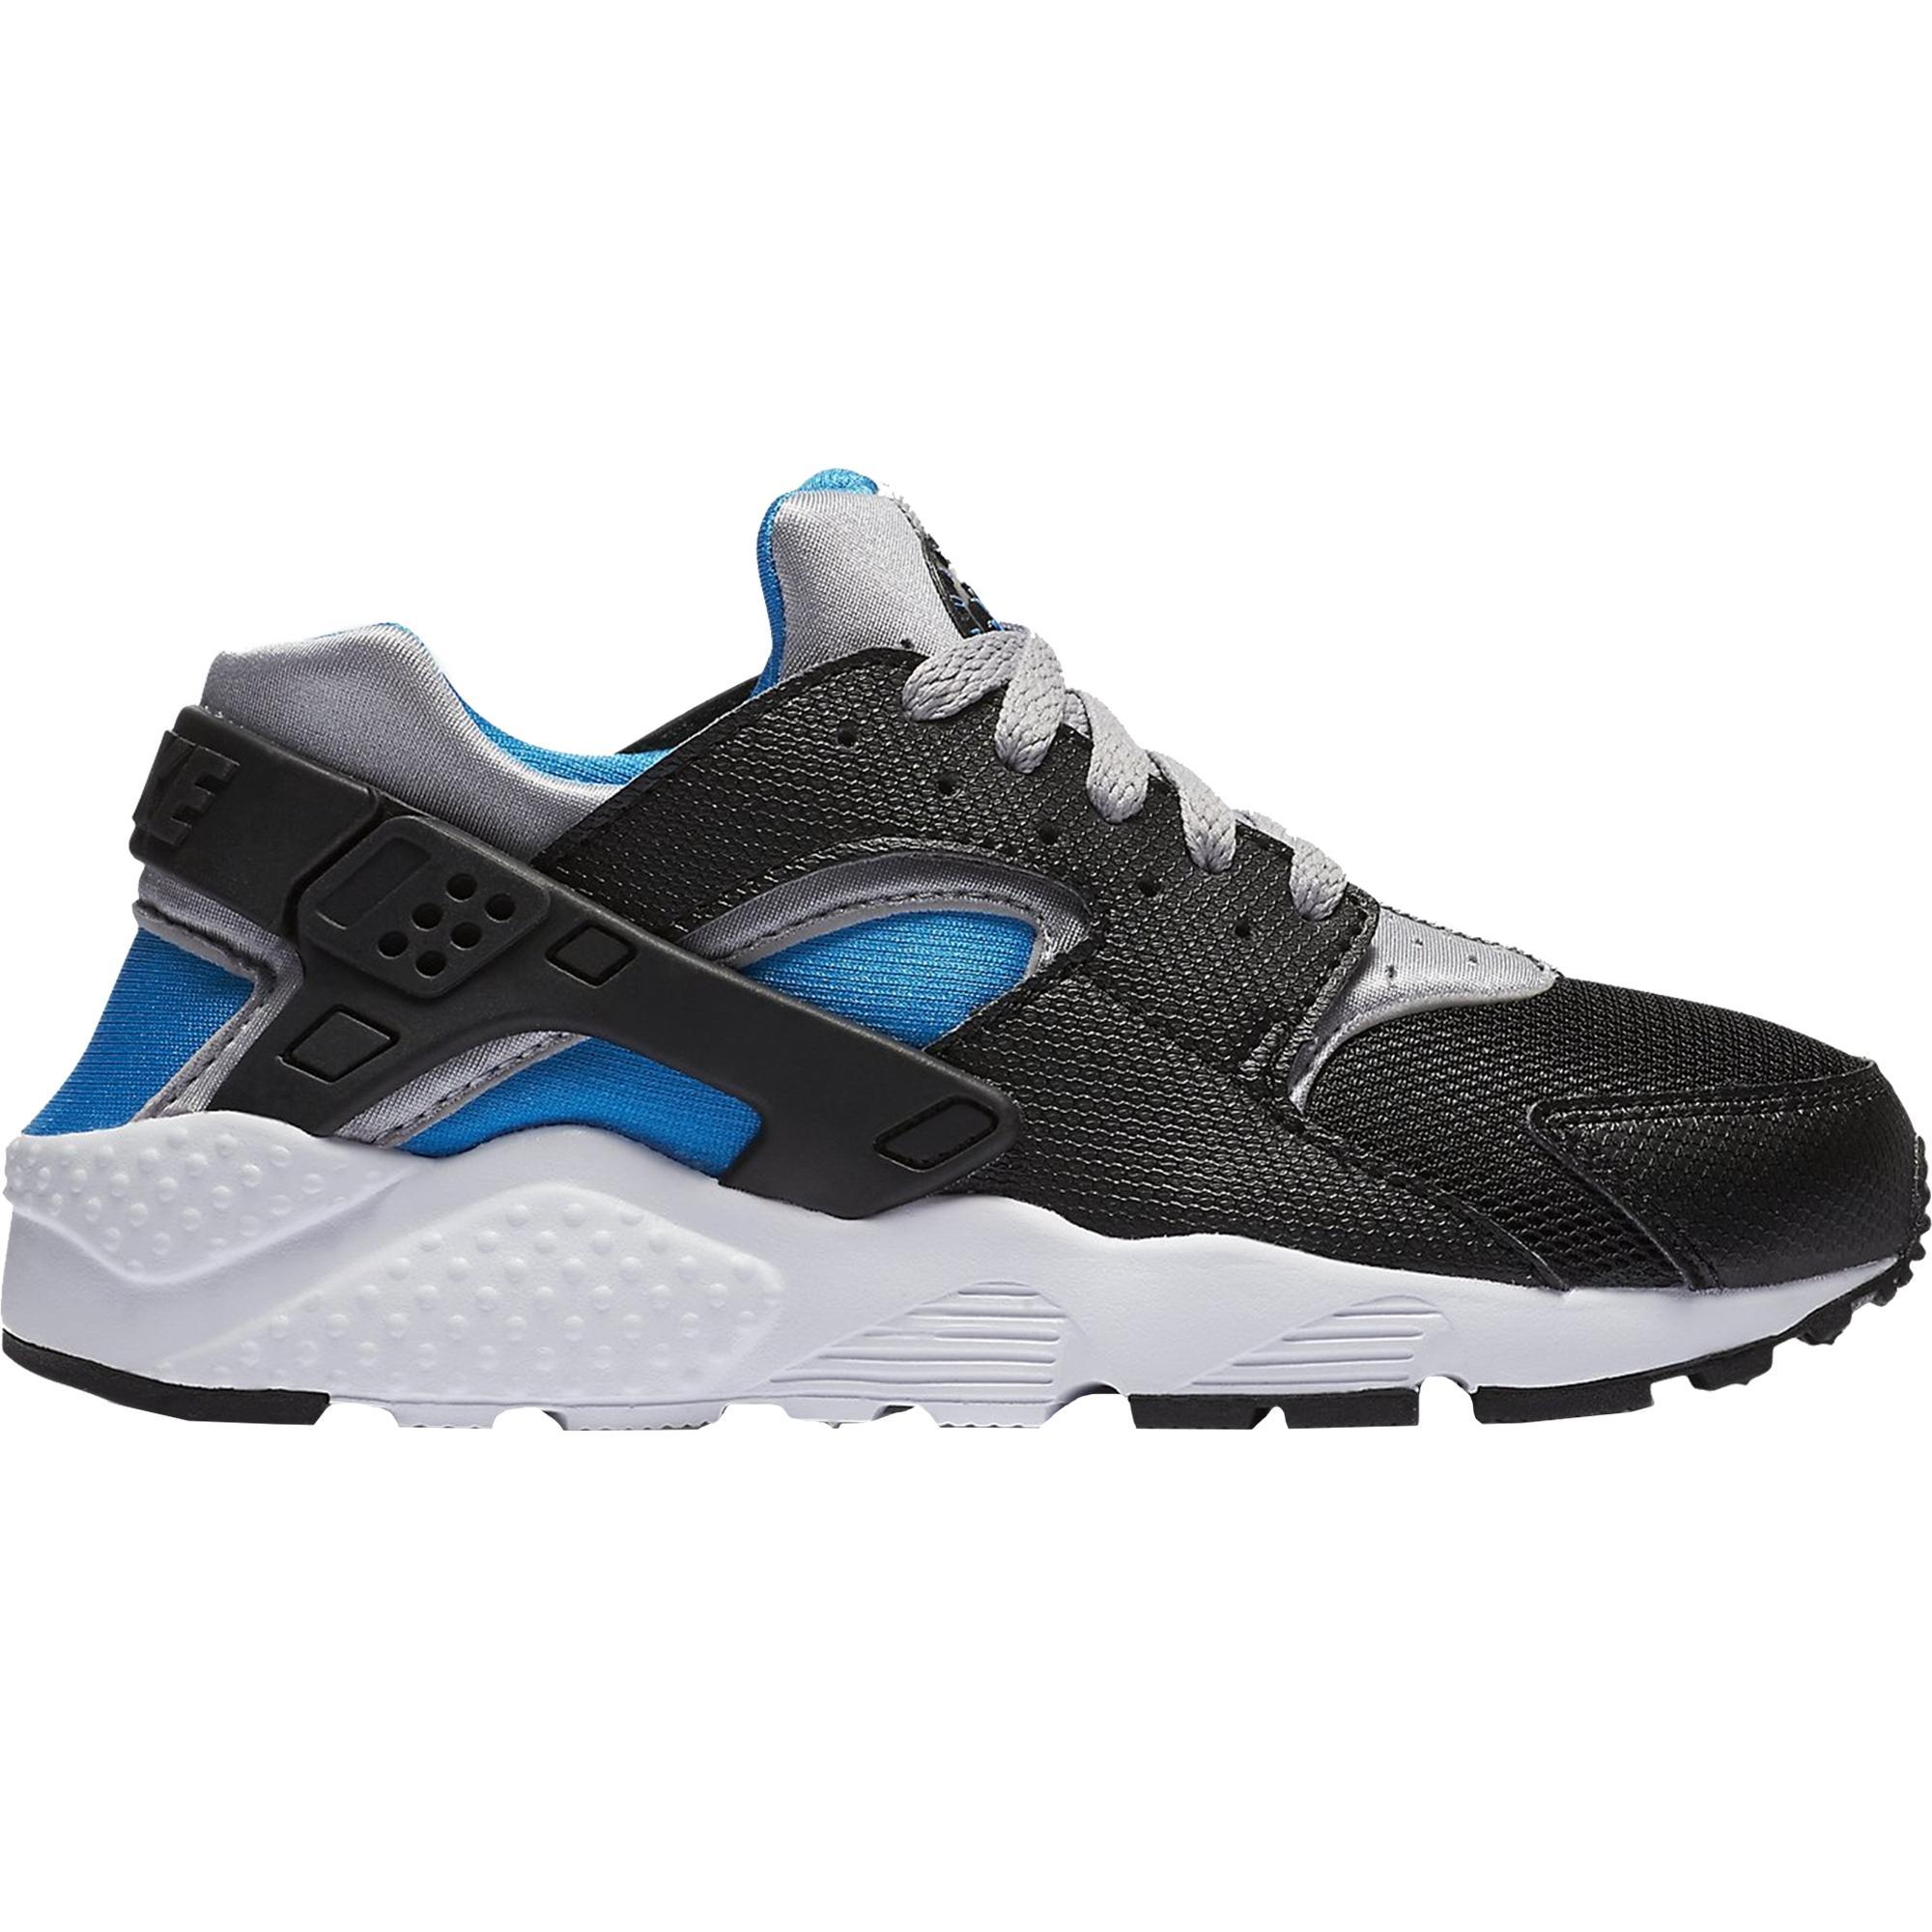 Nike Huarache Run Gs Spor Ayakkabı